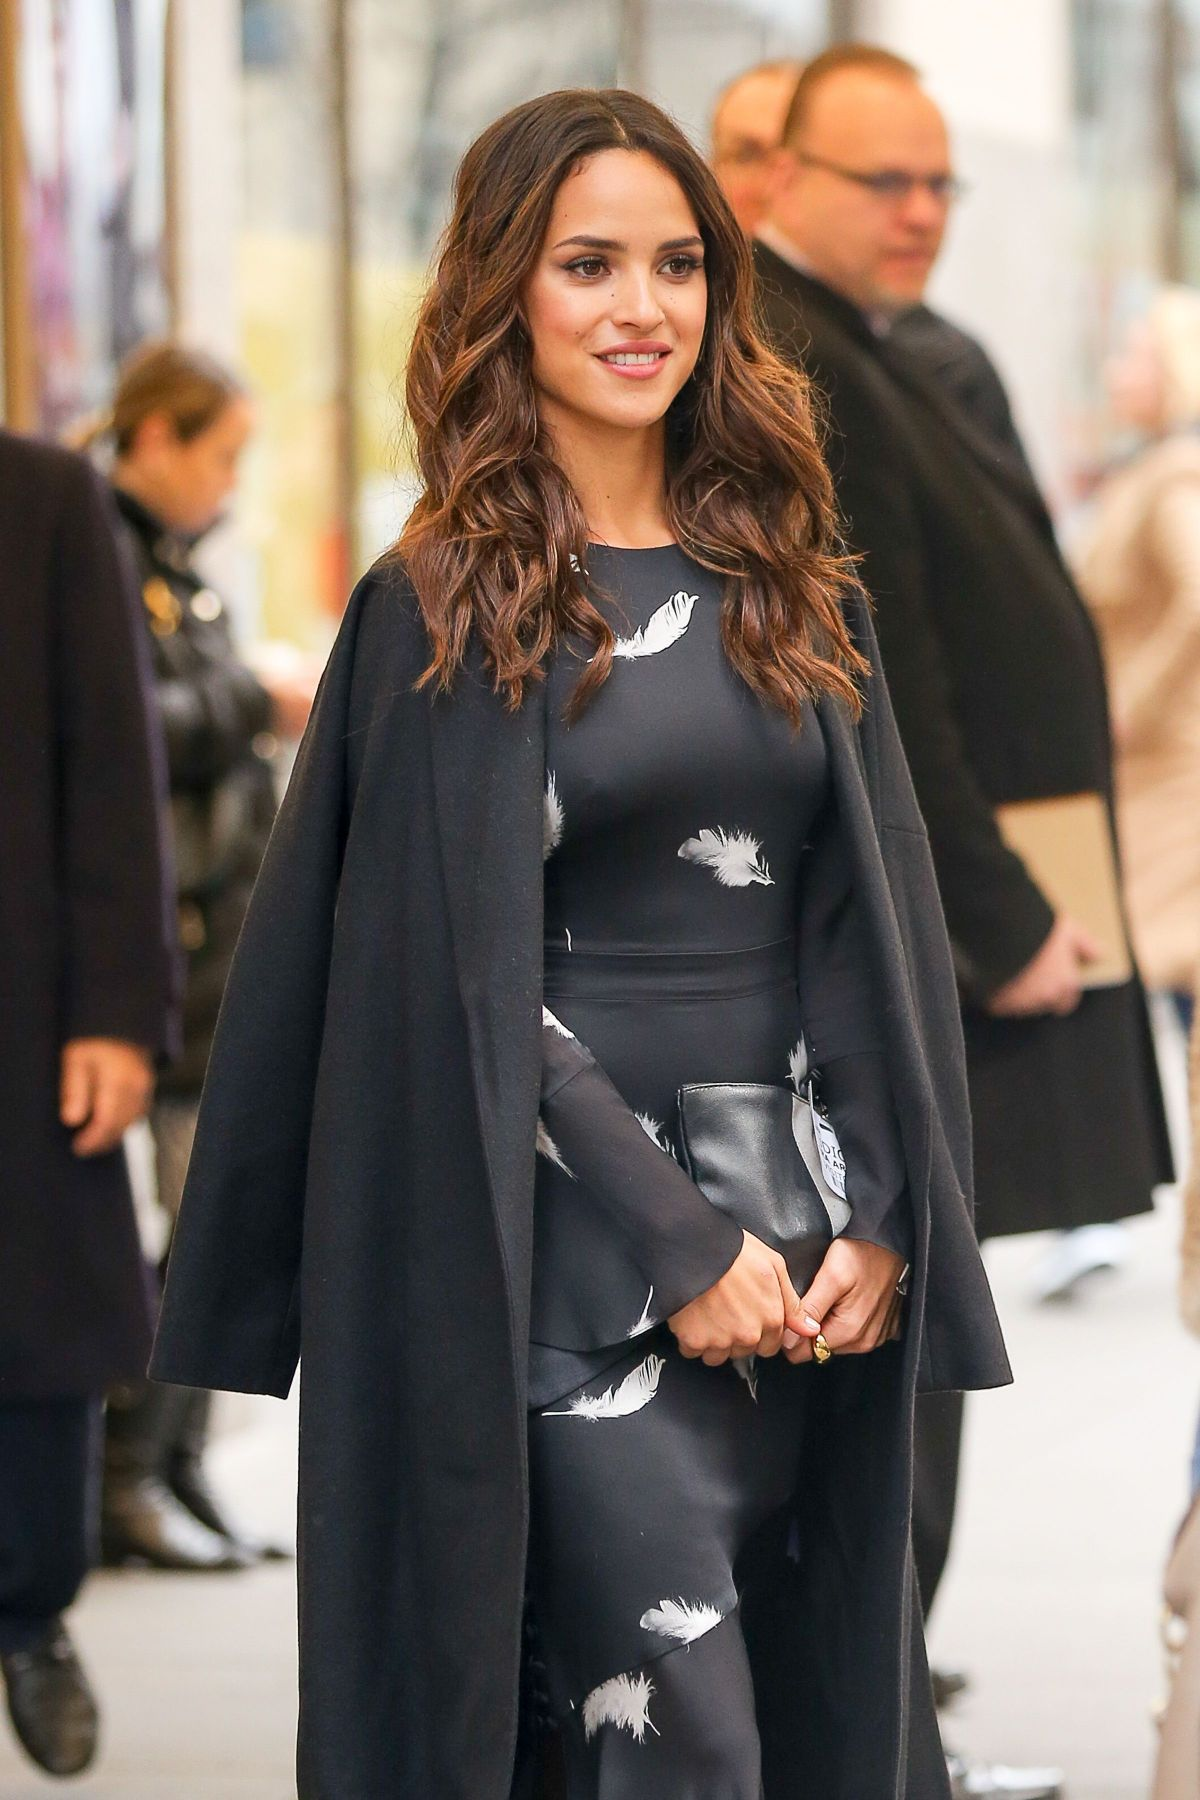 ADRIA ARJONA Leaves NBC Studios in New York 01/04/2017 ...